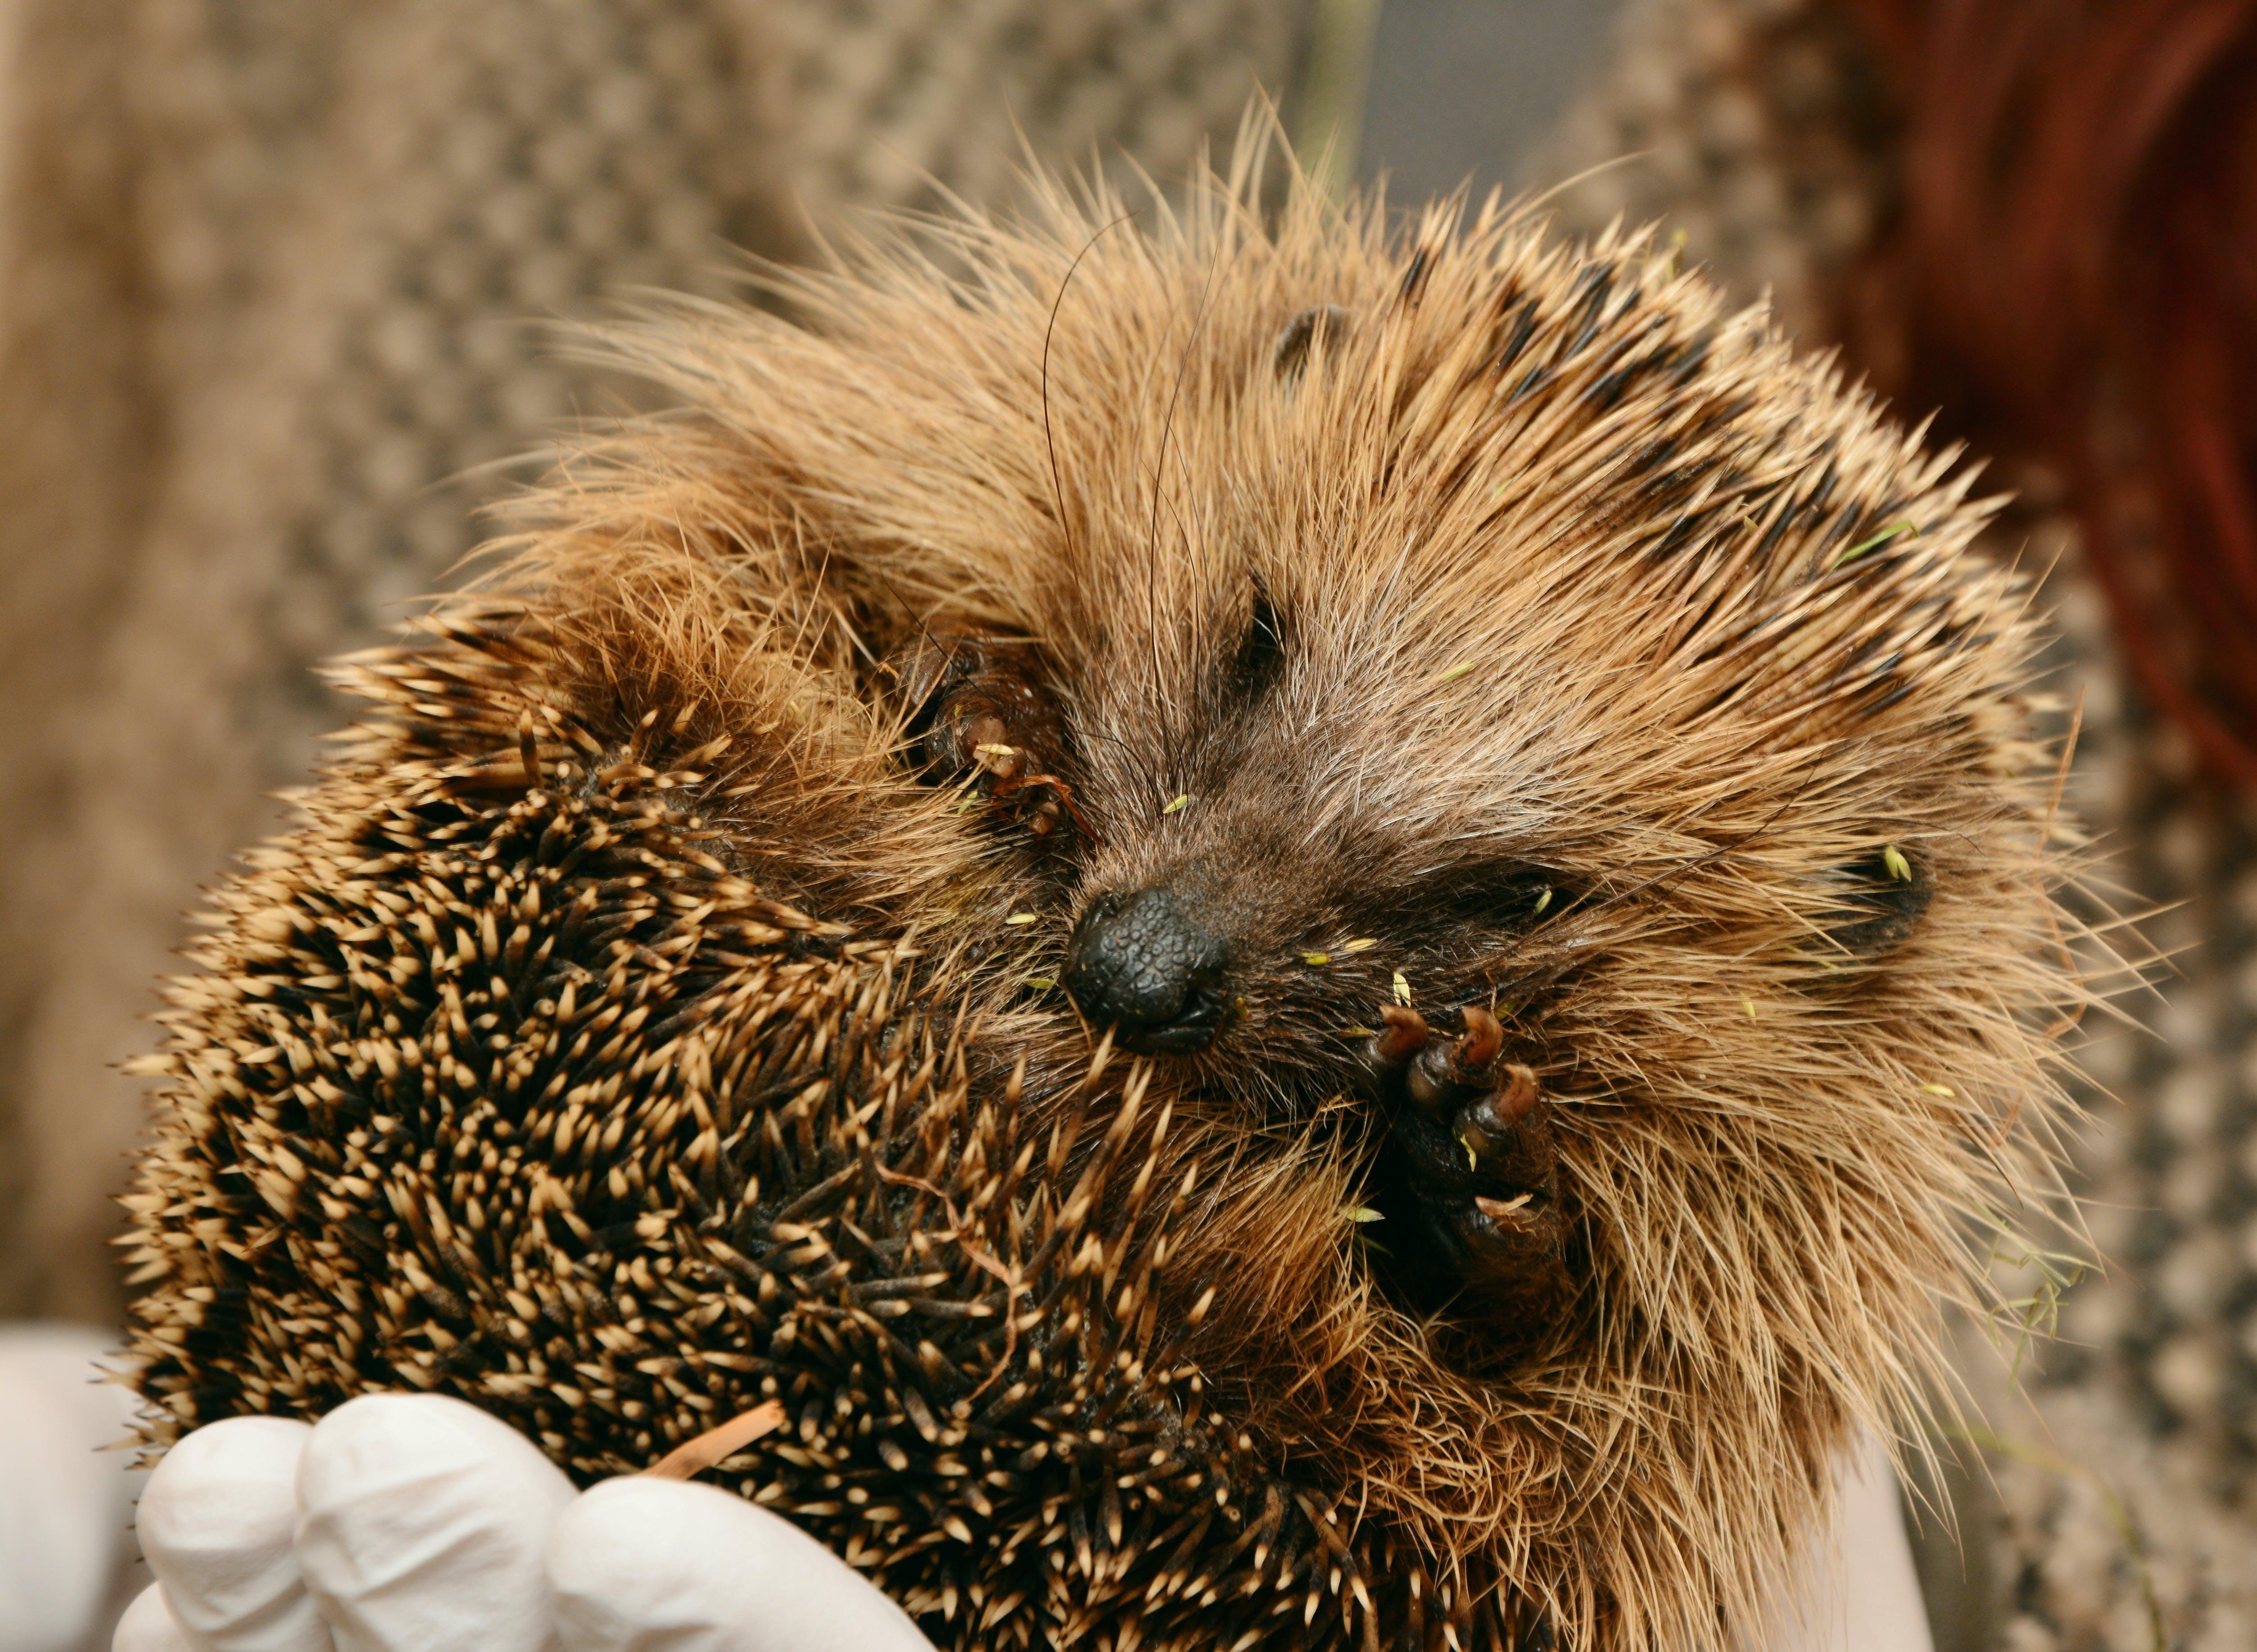 Free stock photo of cute, hedgehog, animal world, young animal